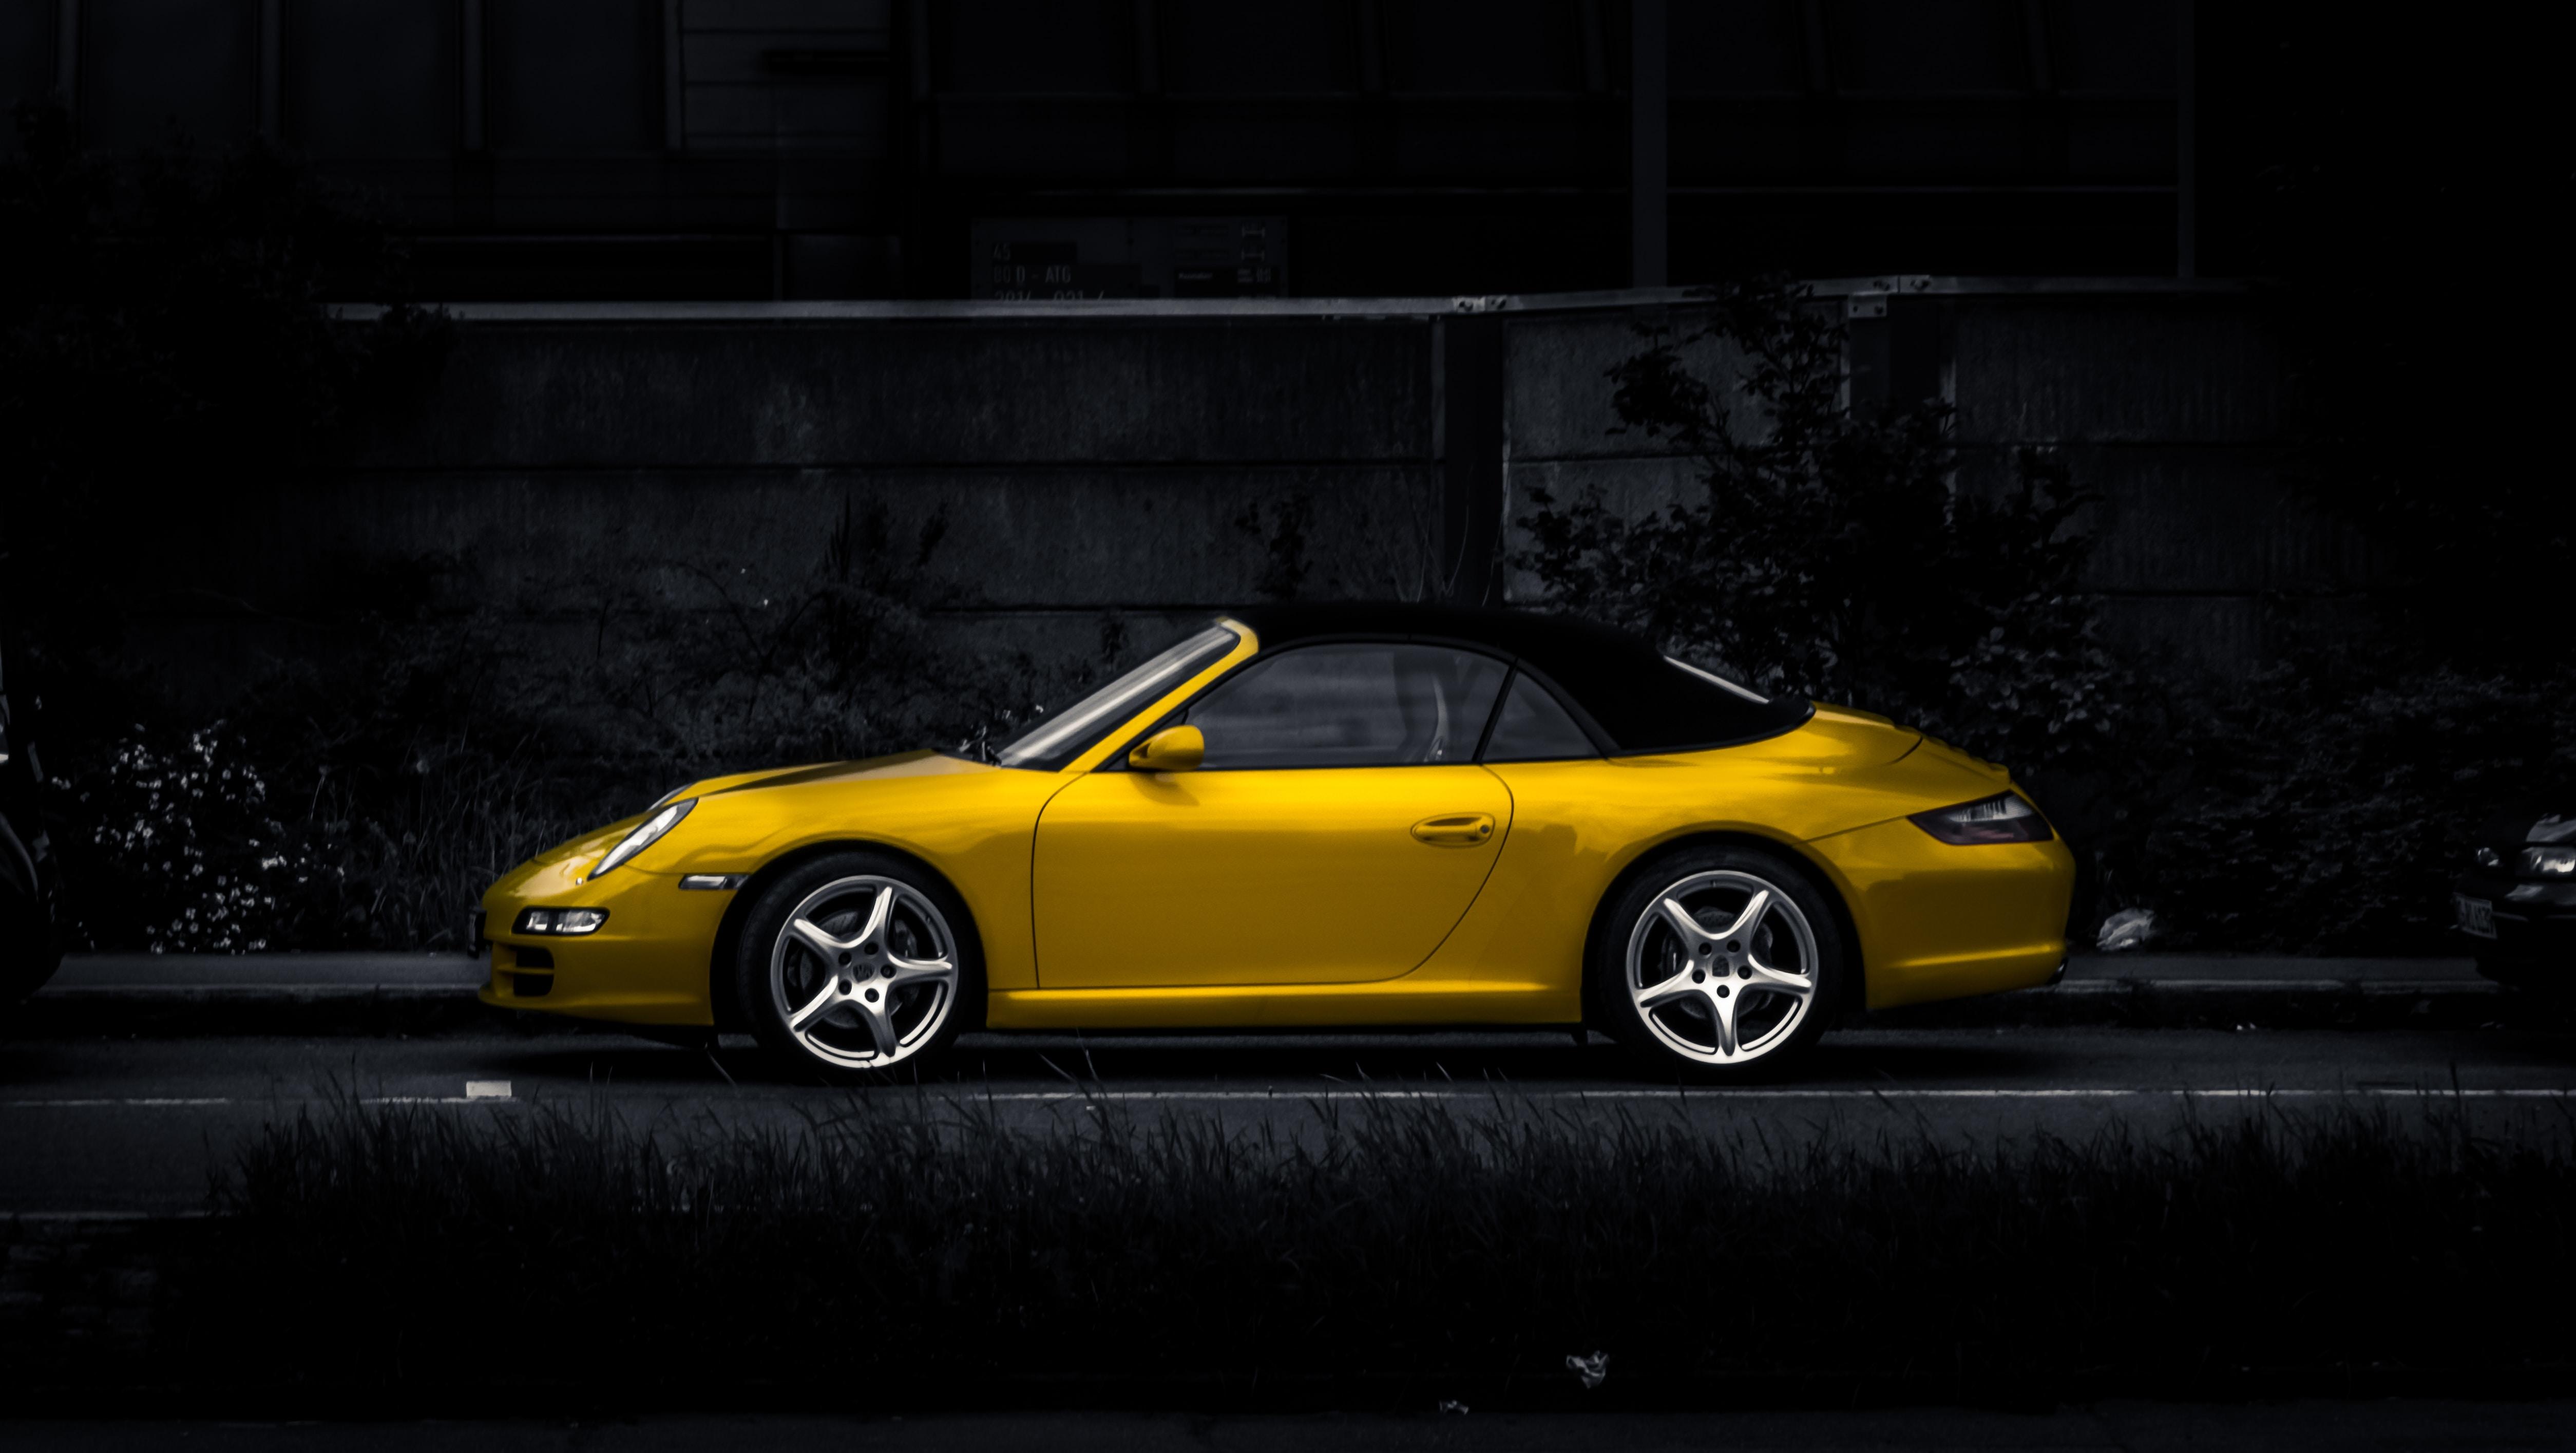 Yellow luxury convertible with dark background